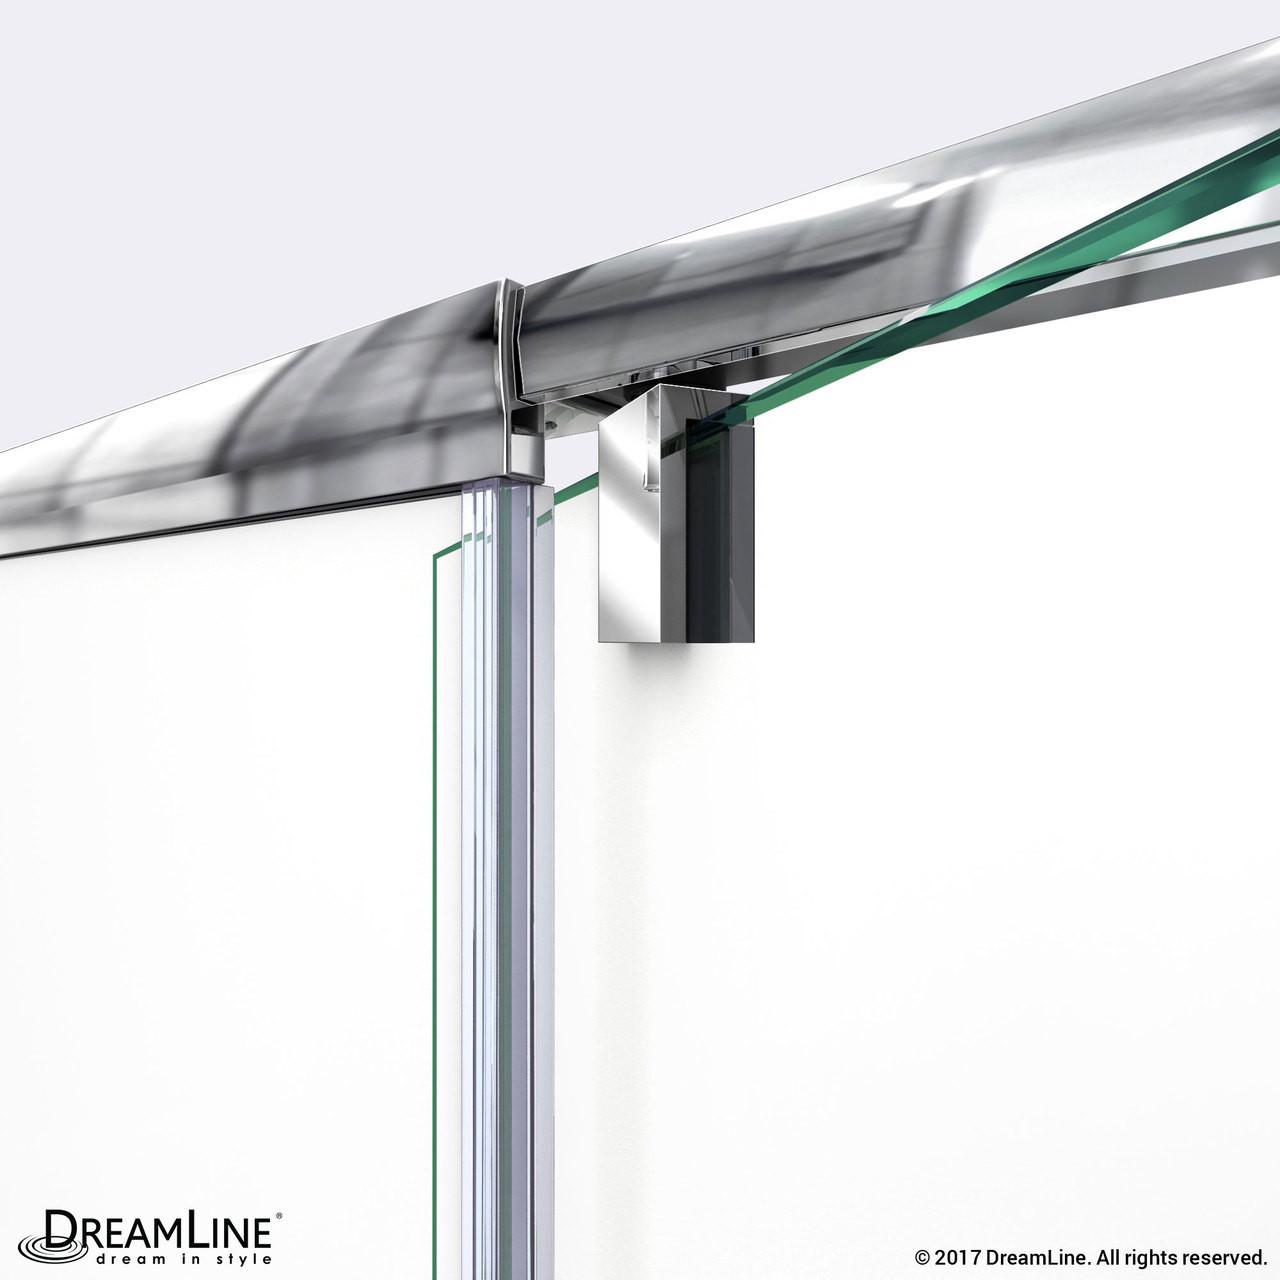 Dreamline Dl 6720l 01cl Flex 36 In D X 60 In W X 74 3 4 In H Semi Frameless Pivot Shower Enclosure In Chrome With Left Drain White Base Kit